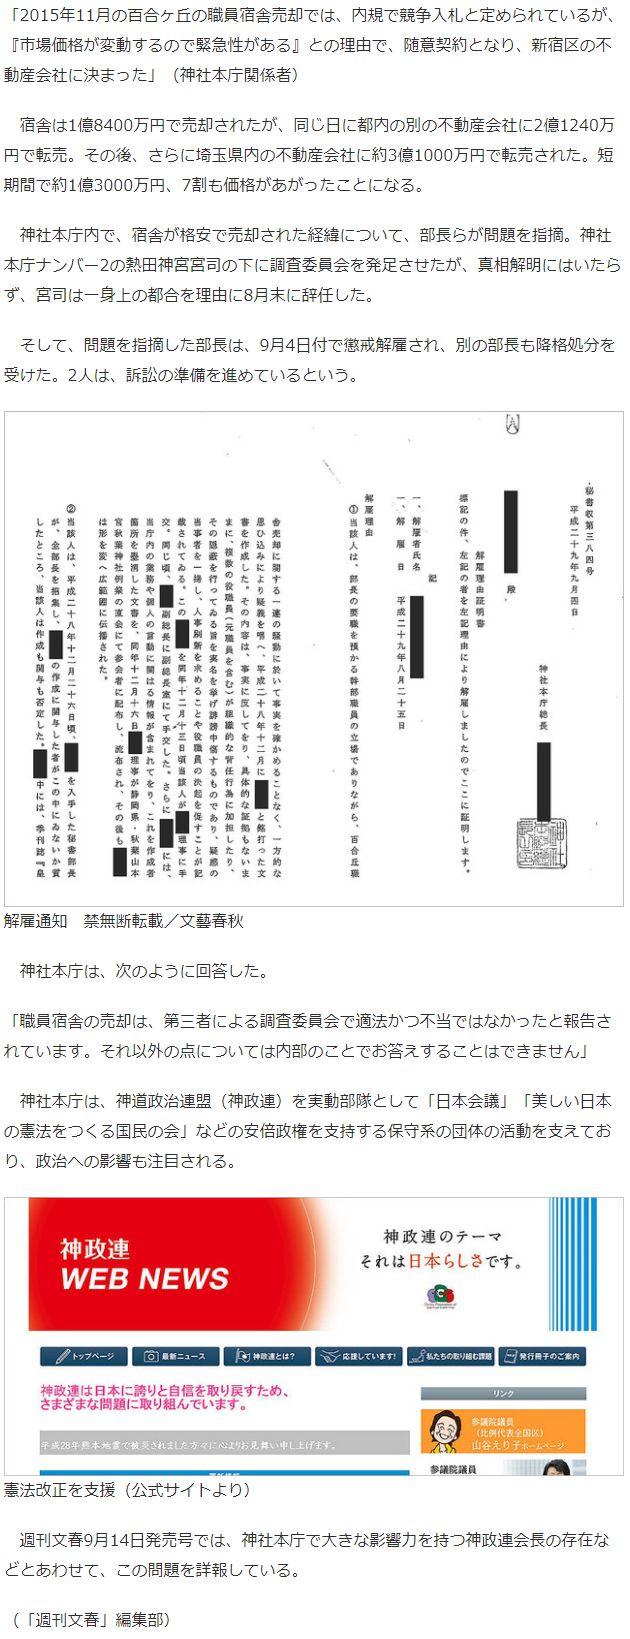 FireShot Screen Capture #493 - 宗教法人の神社本庁 不動産売却を巡る問題を指摘した部長を懲戒解雇 - ライブドアニュース - news_livedoor_com_article_detail_13606980